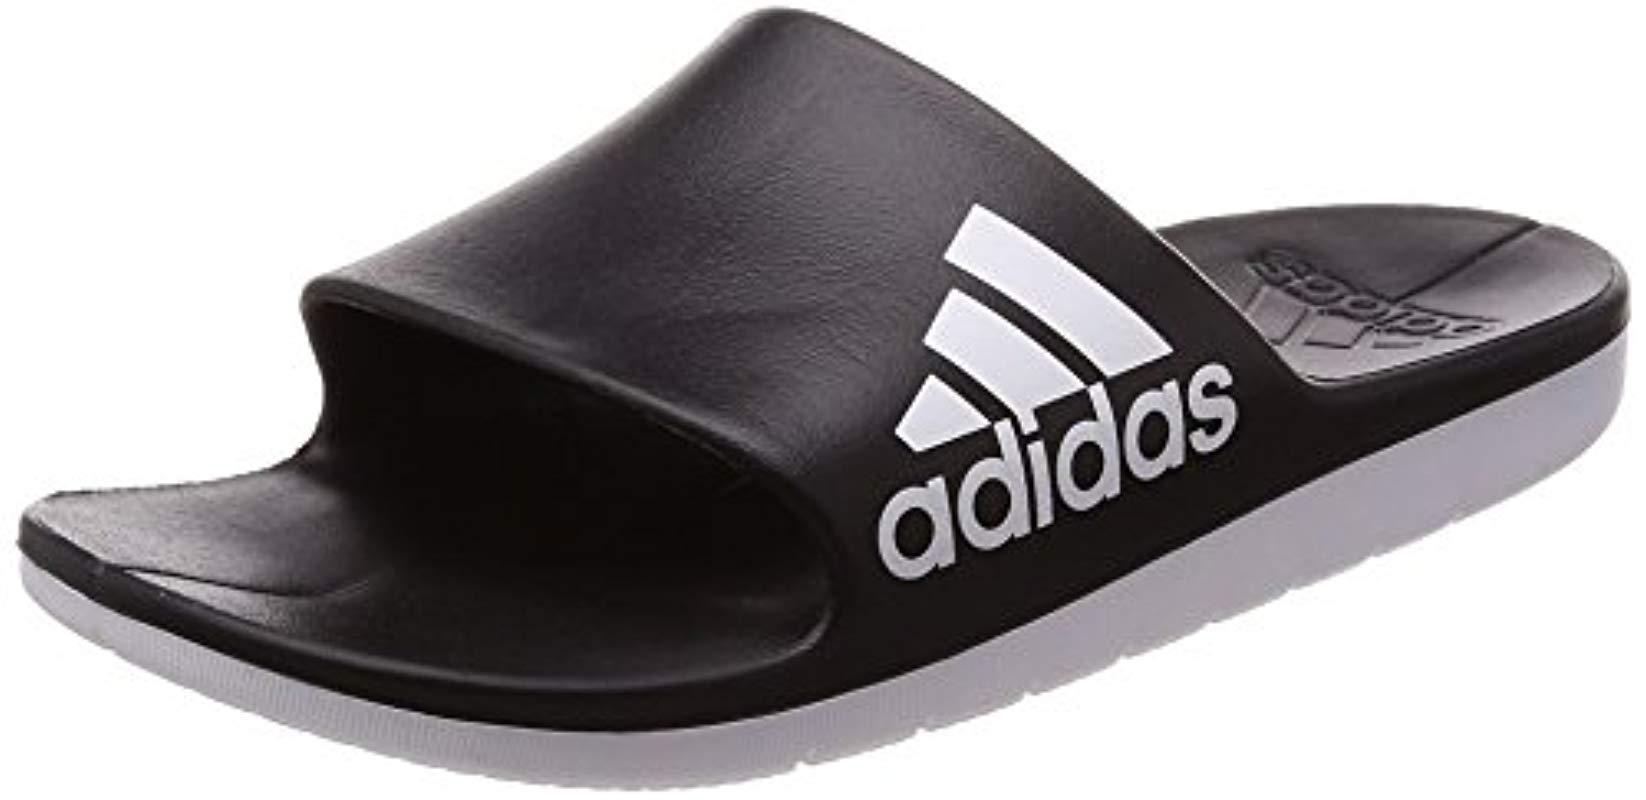 the latest 3b46d f9689 Lyst - Aqualette Cloudfoam, Zapatos de Playa y Piscina para